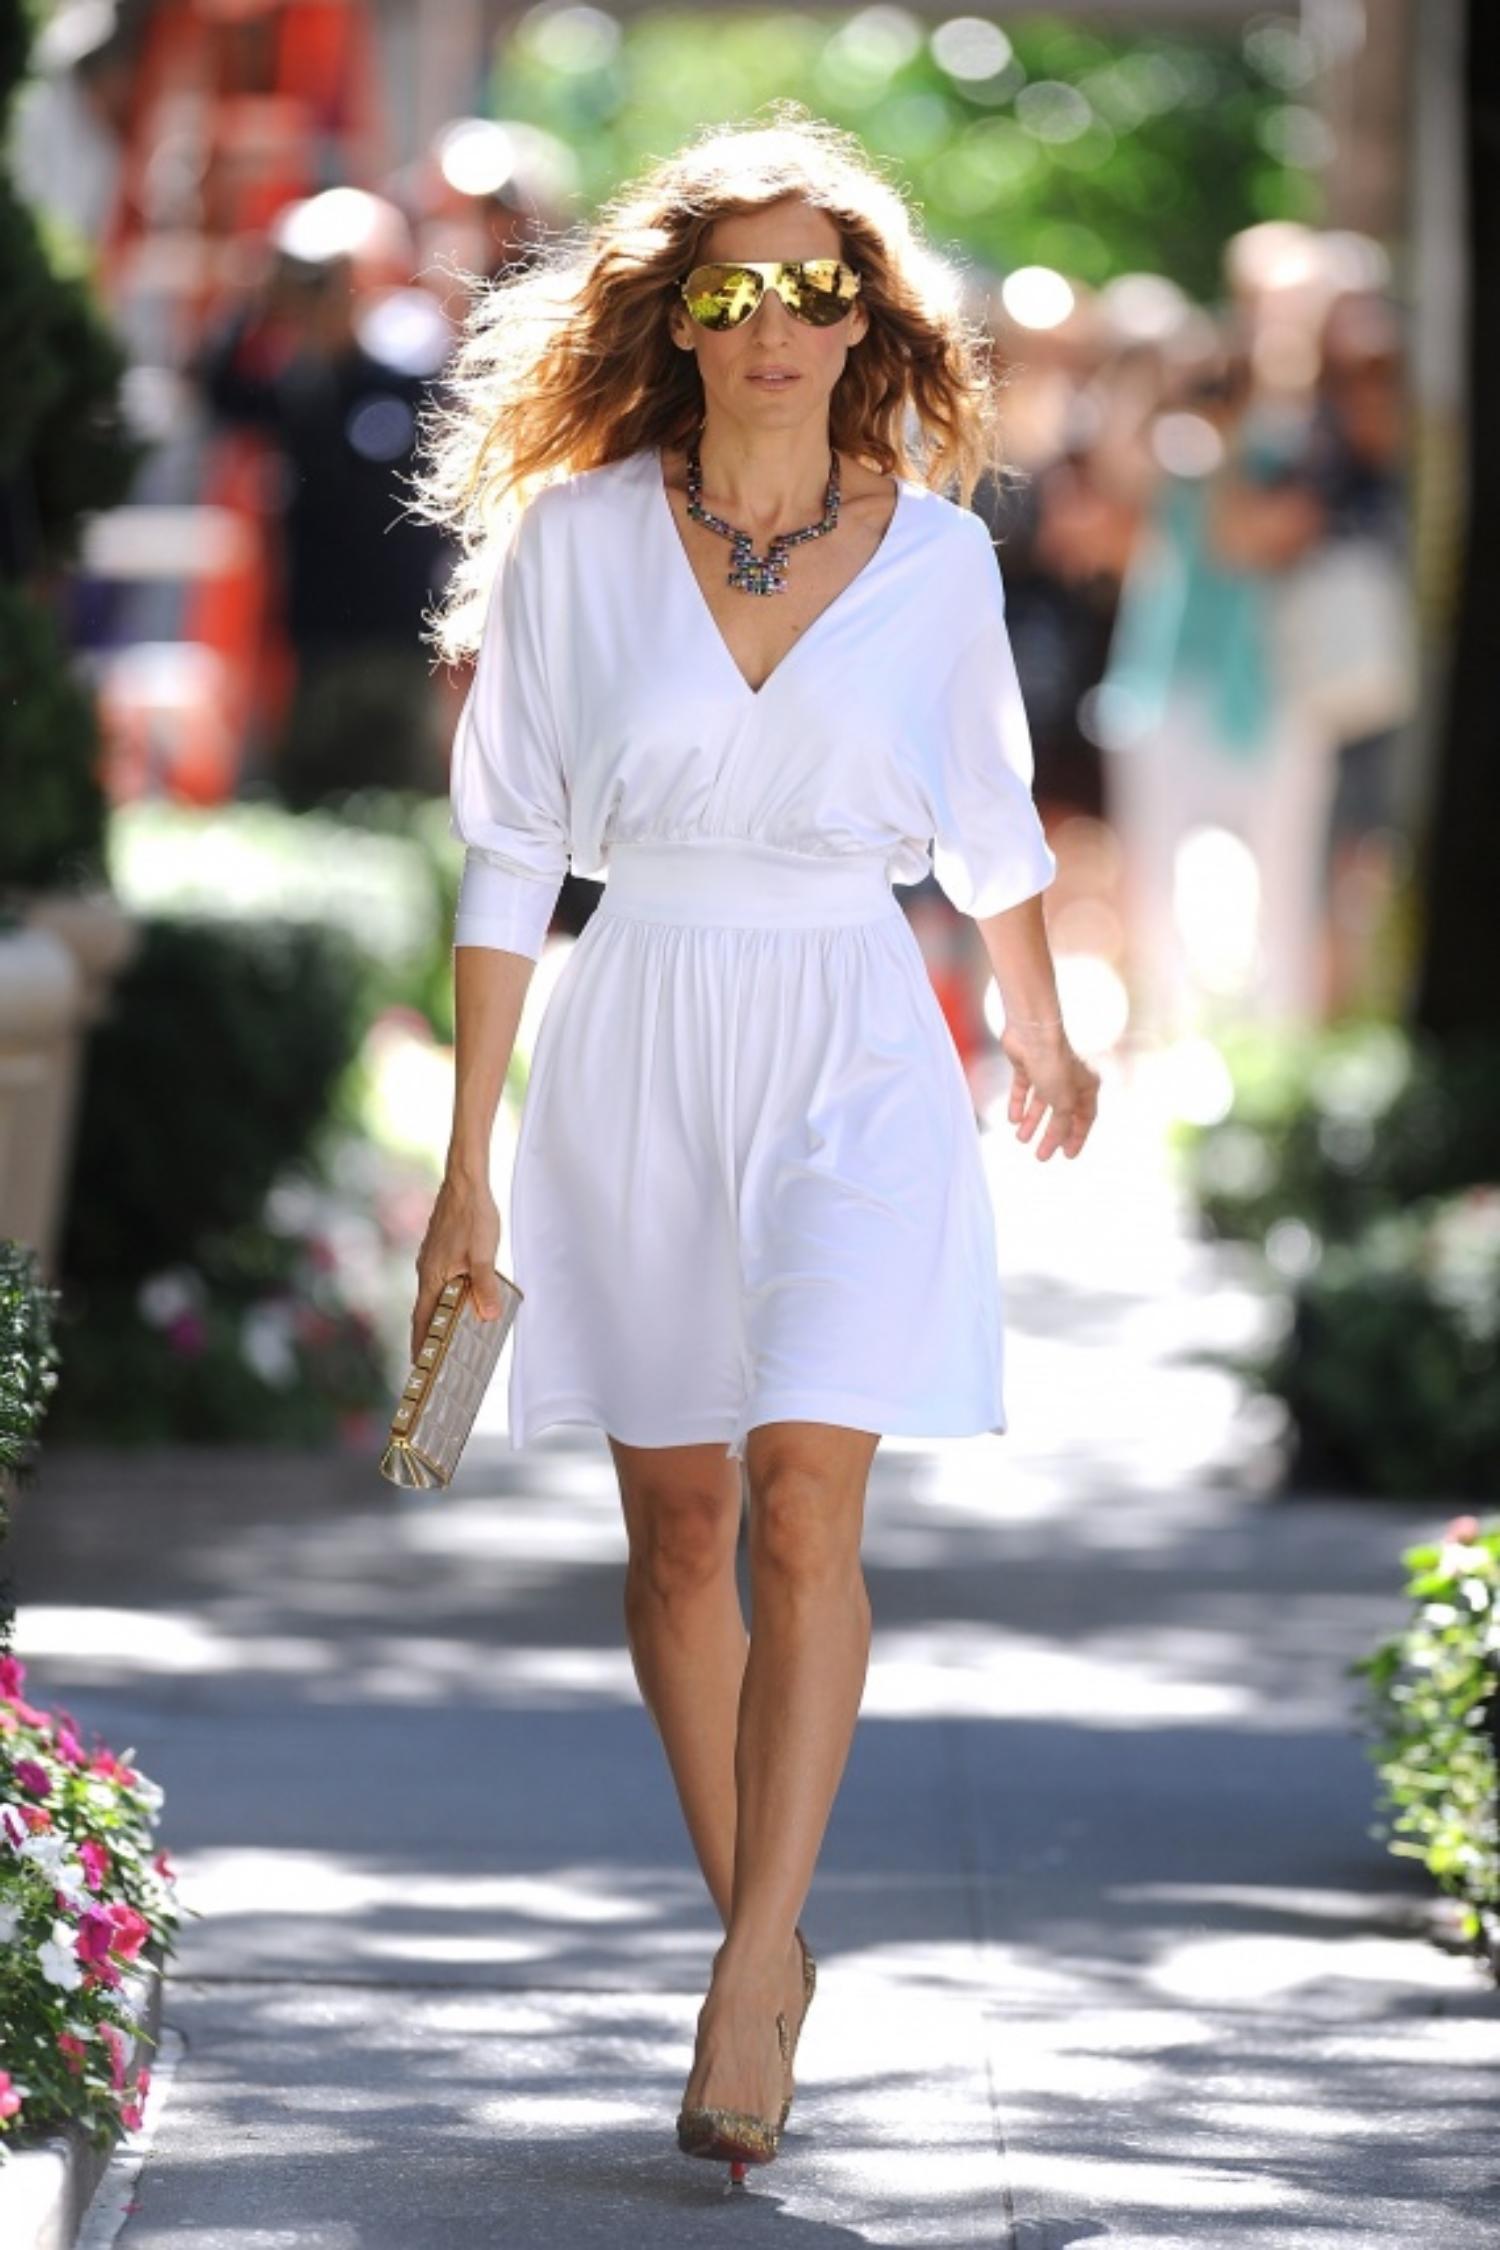 Sarah Jessica Parker 在 SATC 2 , 簡單的白裙子配上Mirrored Sunglasses , 不僅時尚感100分, Deborah 覺得看起來更是氣勢十足啊!